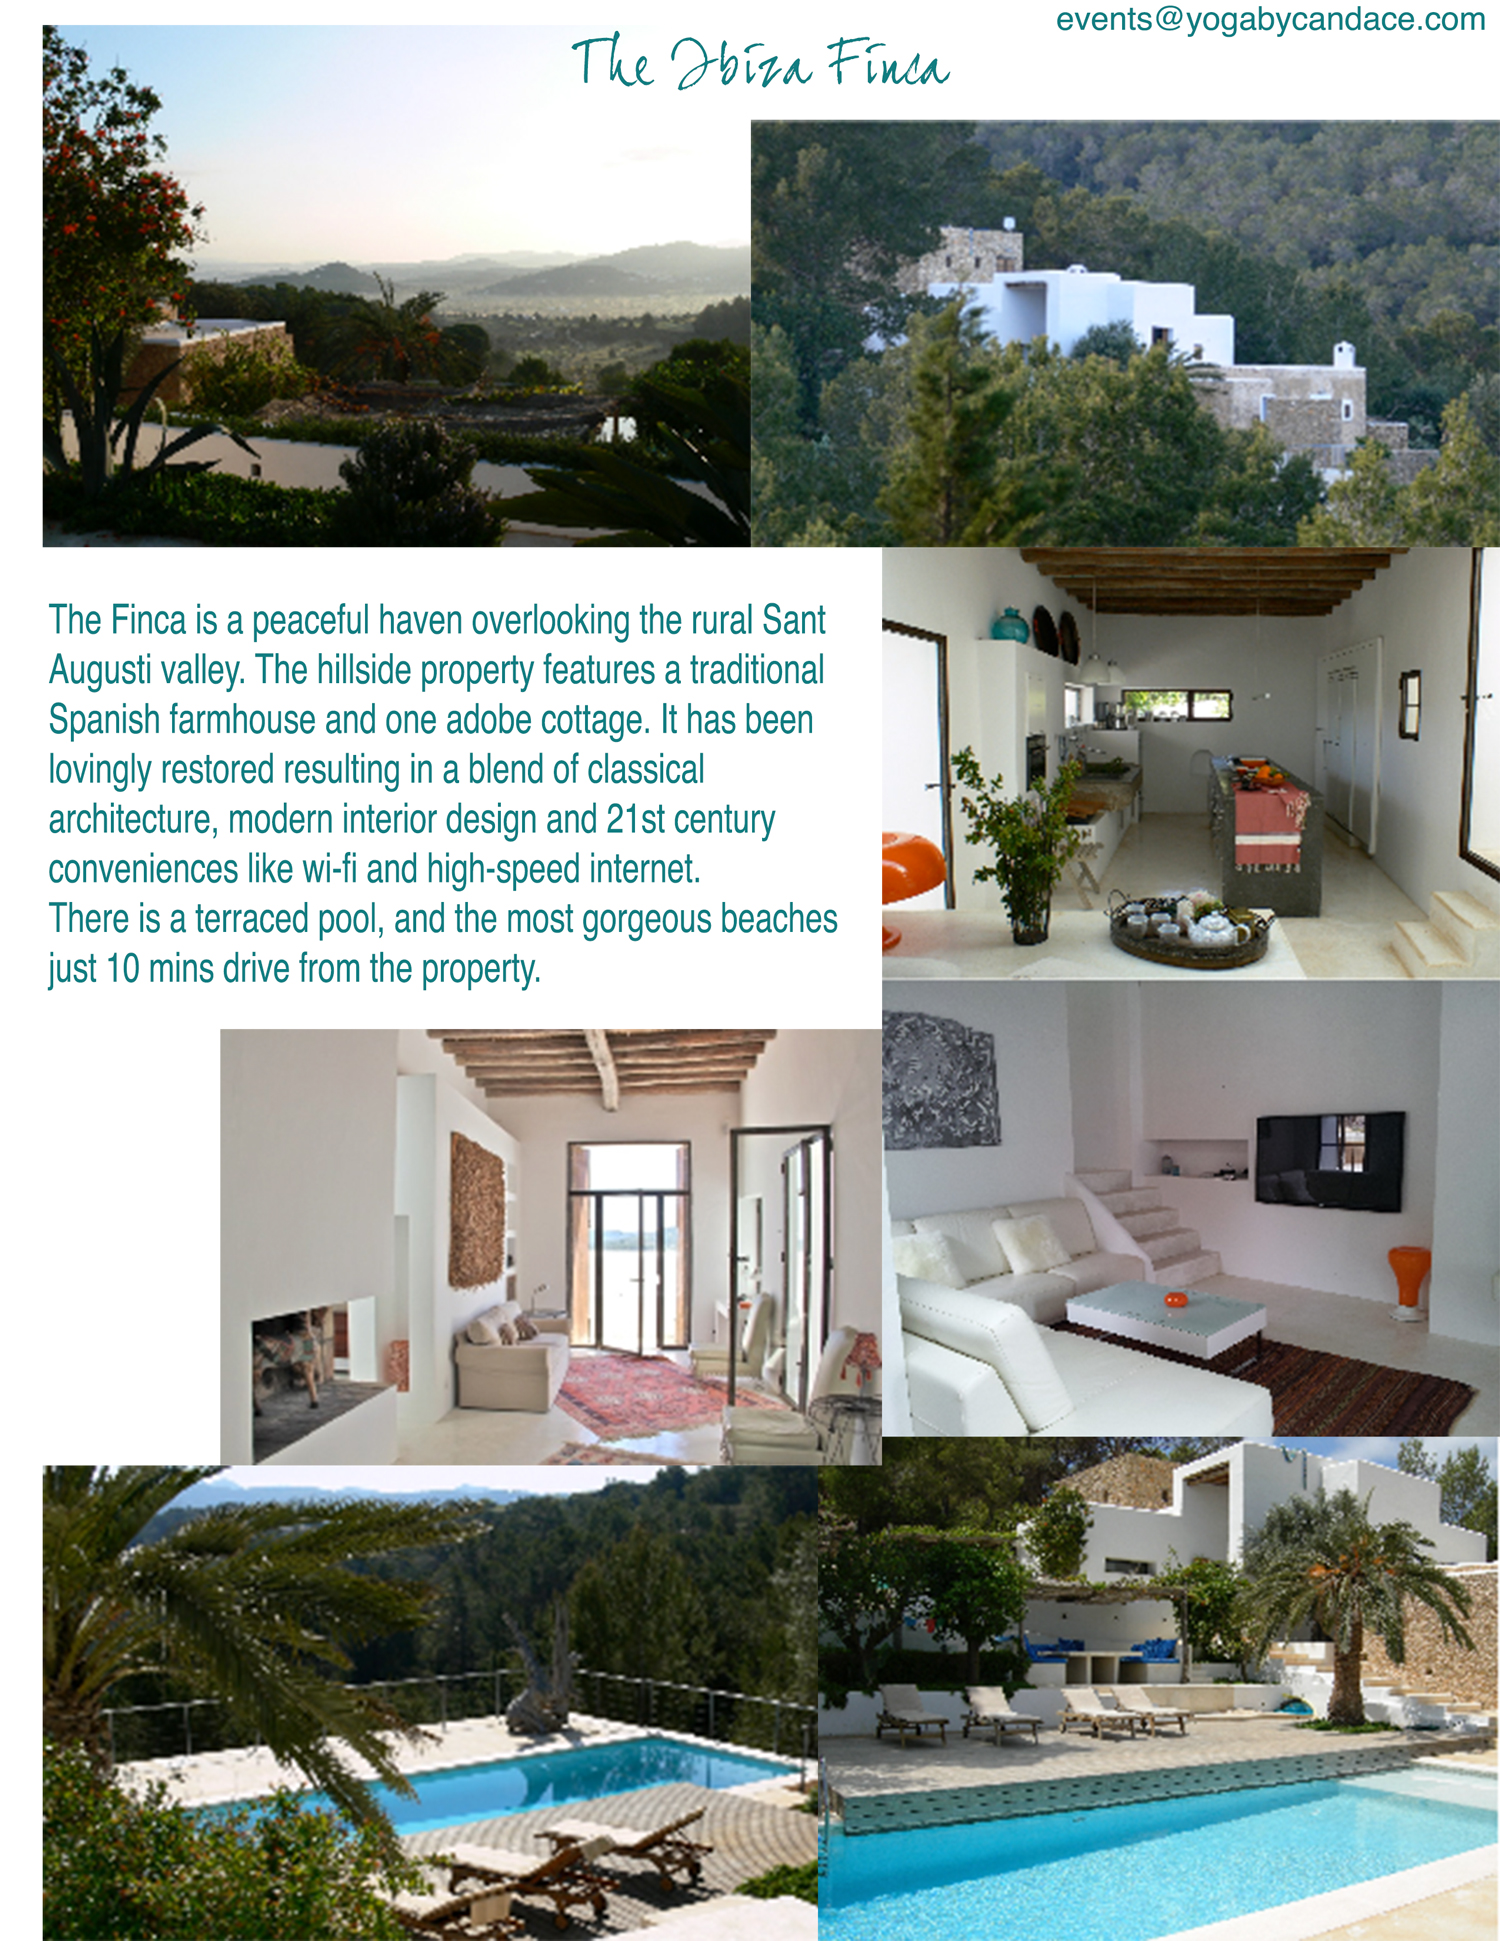 Ibiza yoga retreat property overview